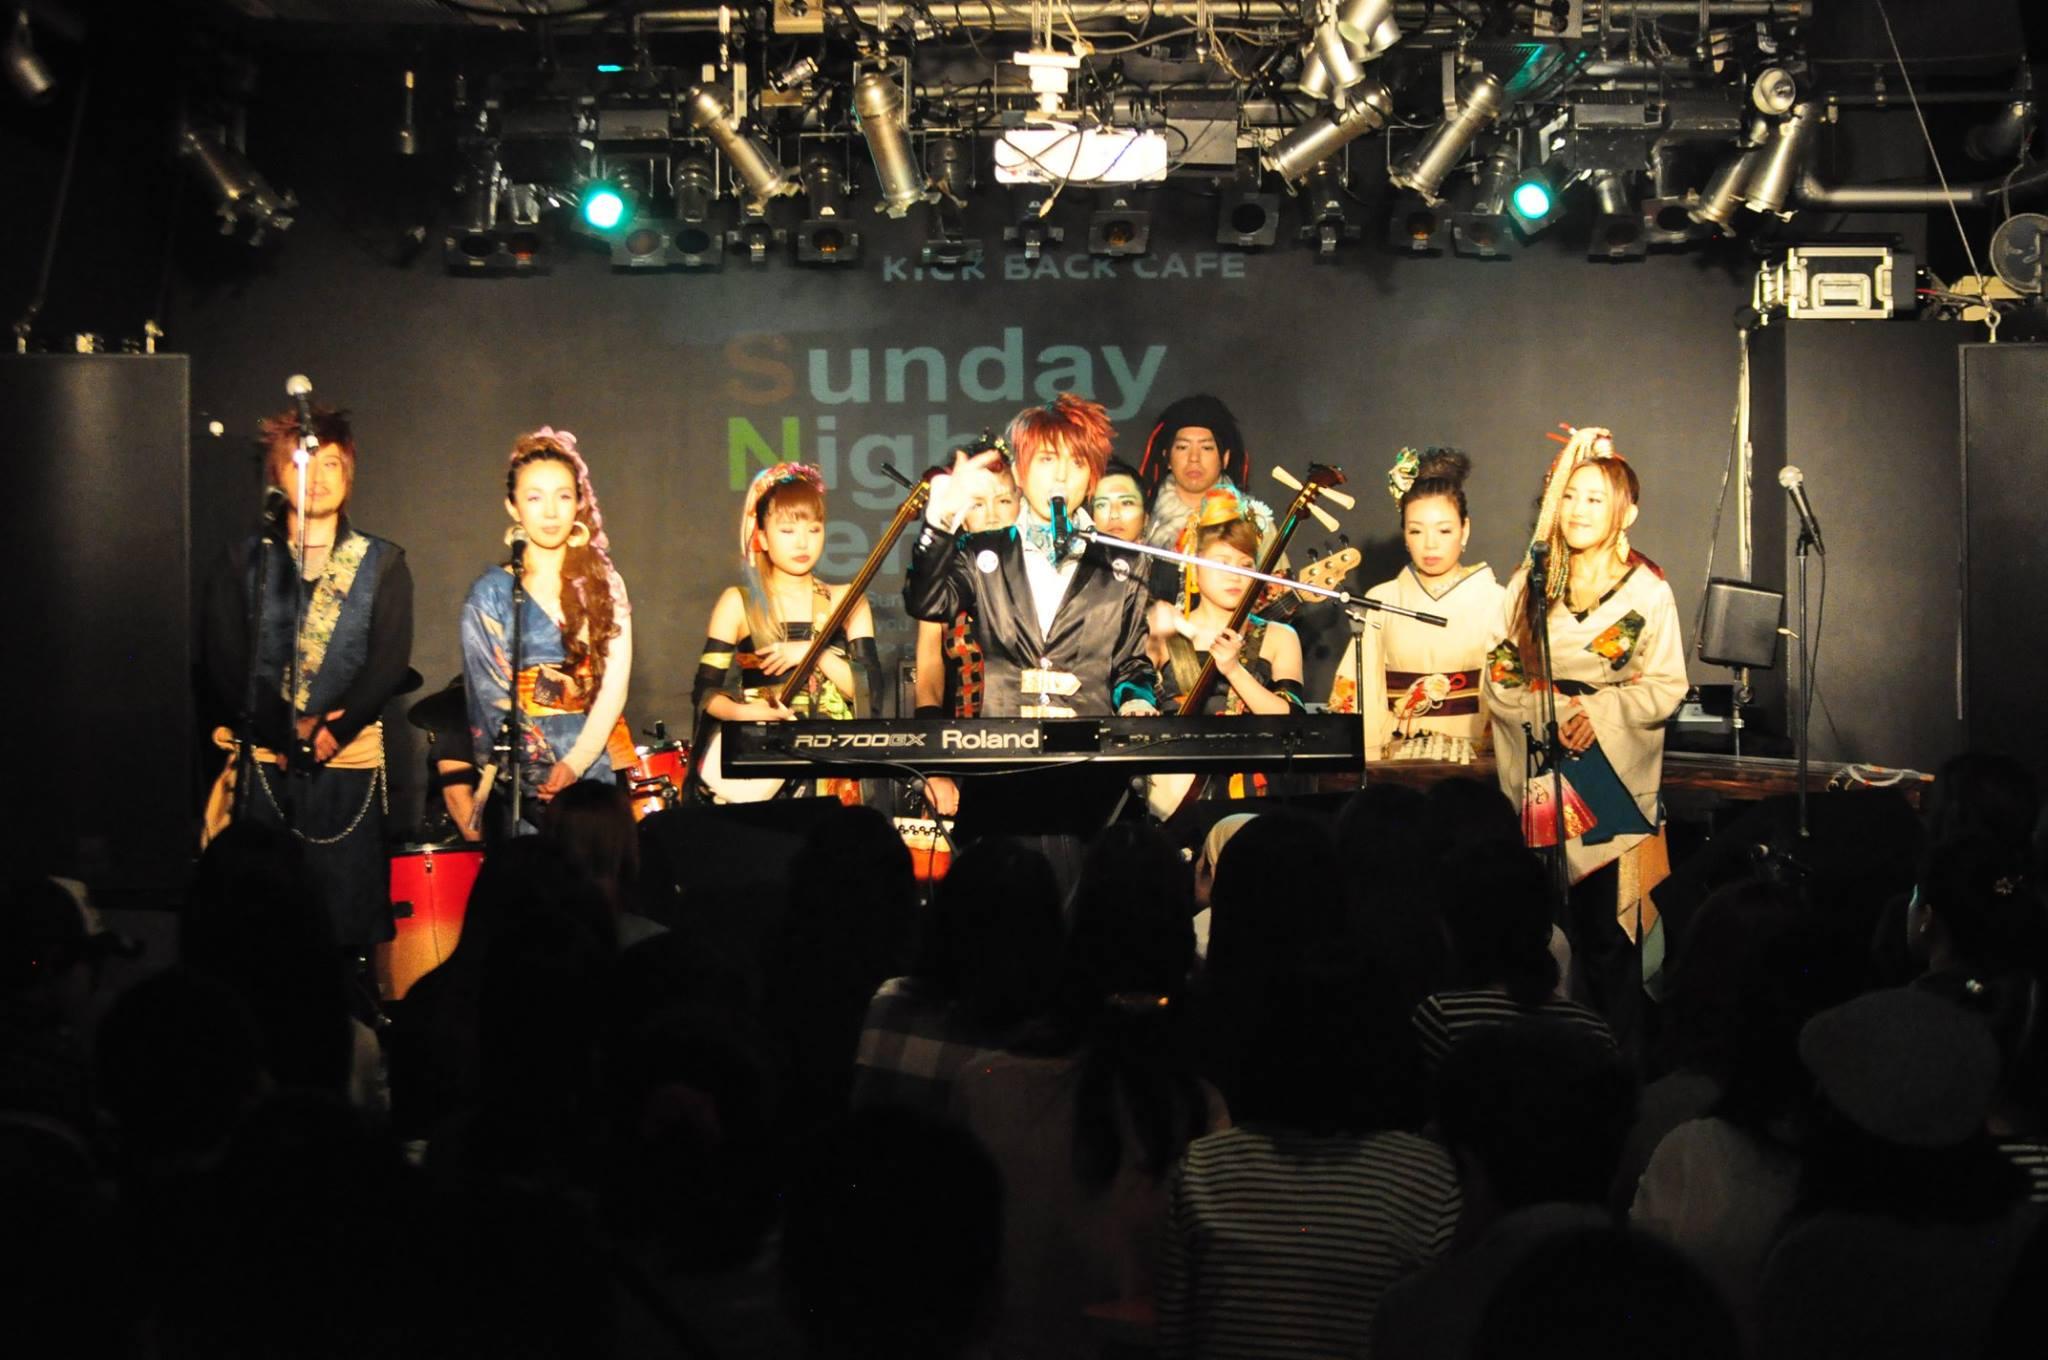 http://www.kickbackcafe.jp/support2/report/20160501-5.jpg